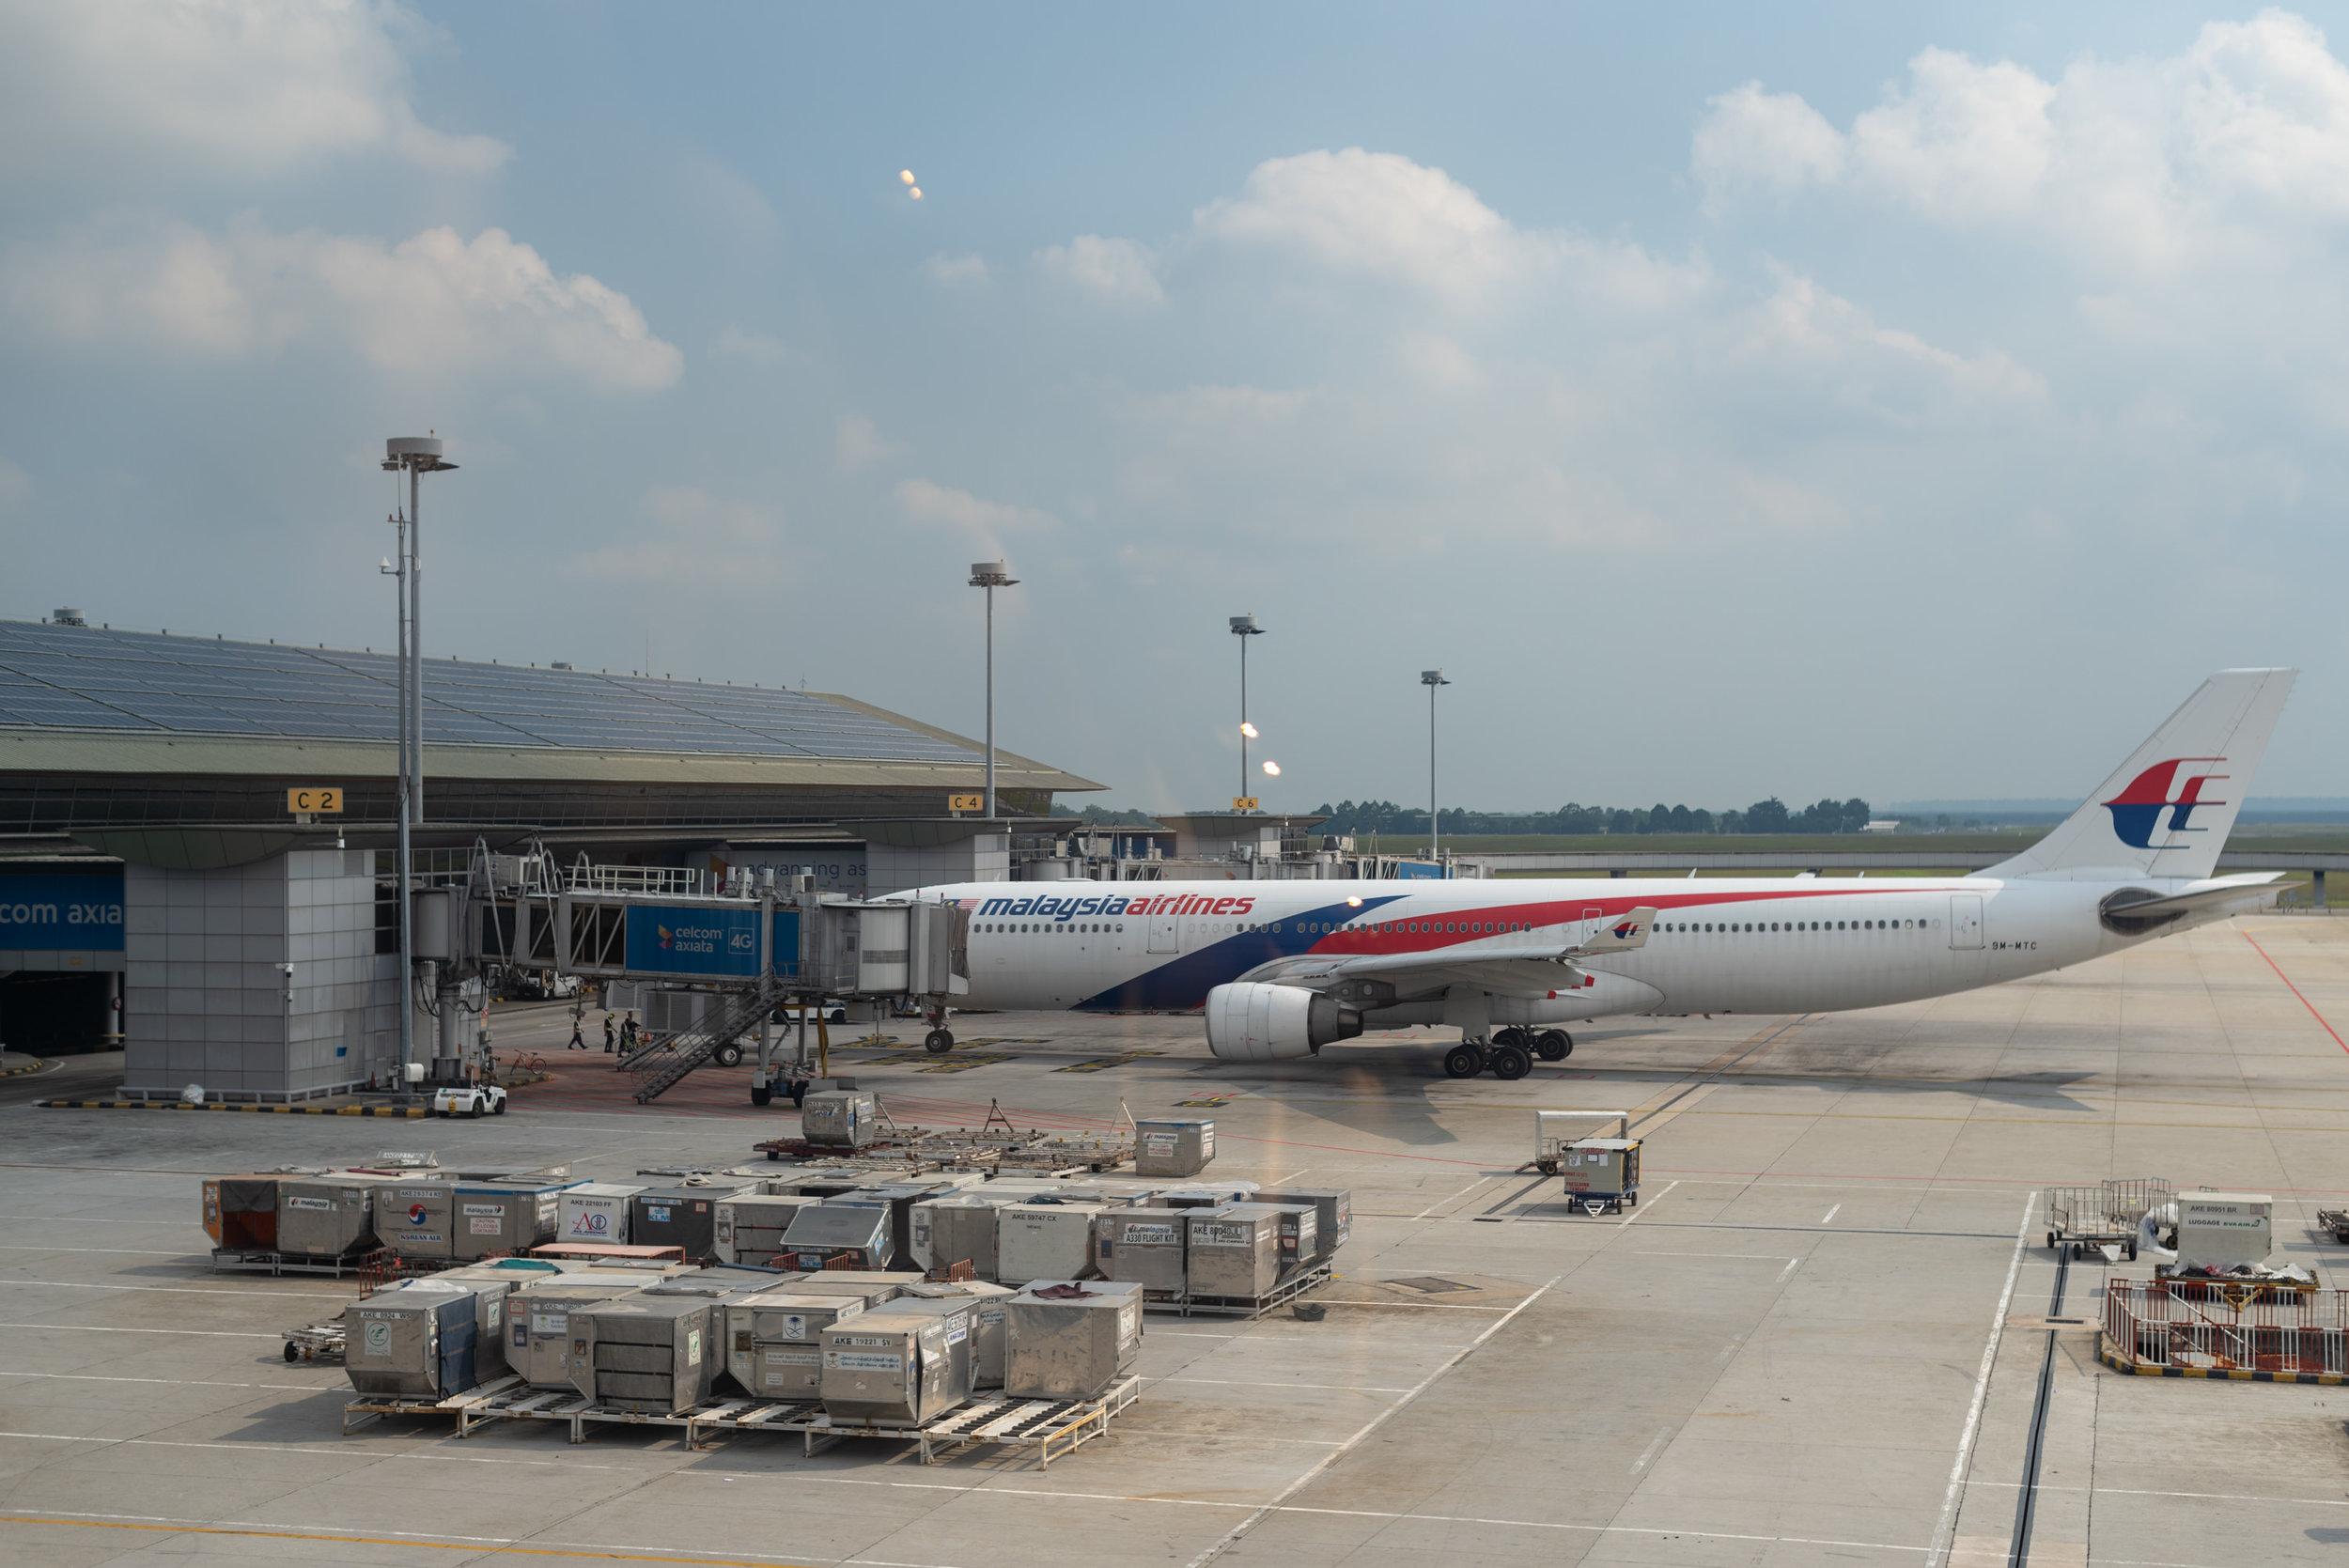 View from the Lounge  Singapore Airlines SilverKris Lounge - Kuala Lumpur International Airport (KLIA)